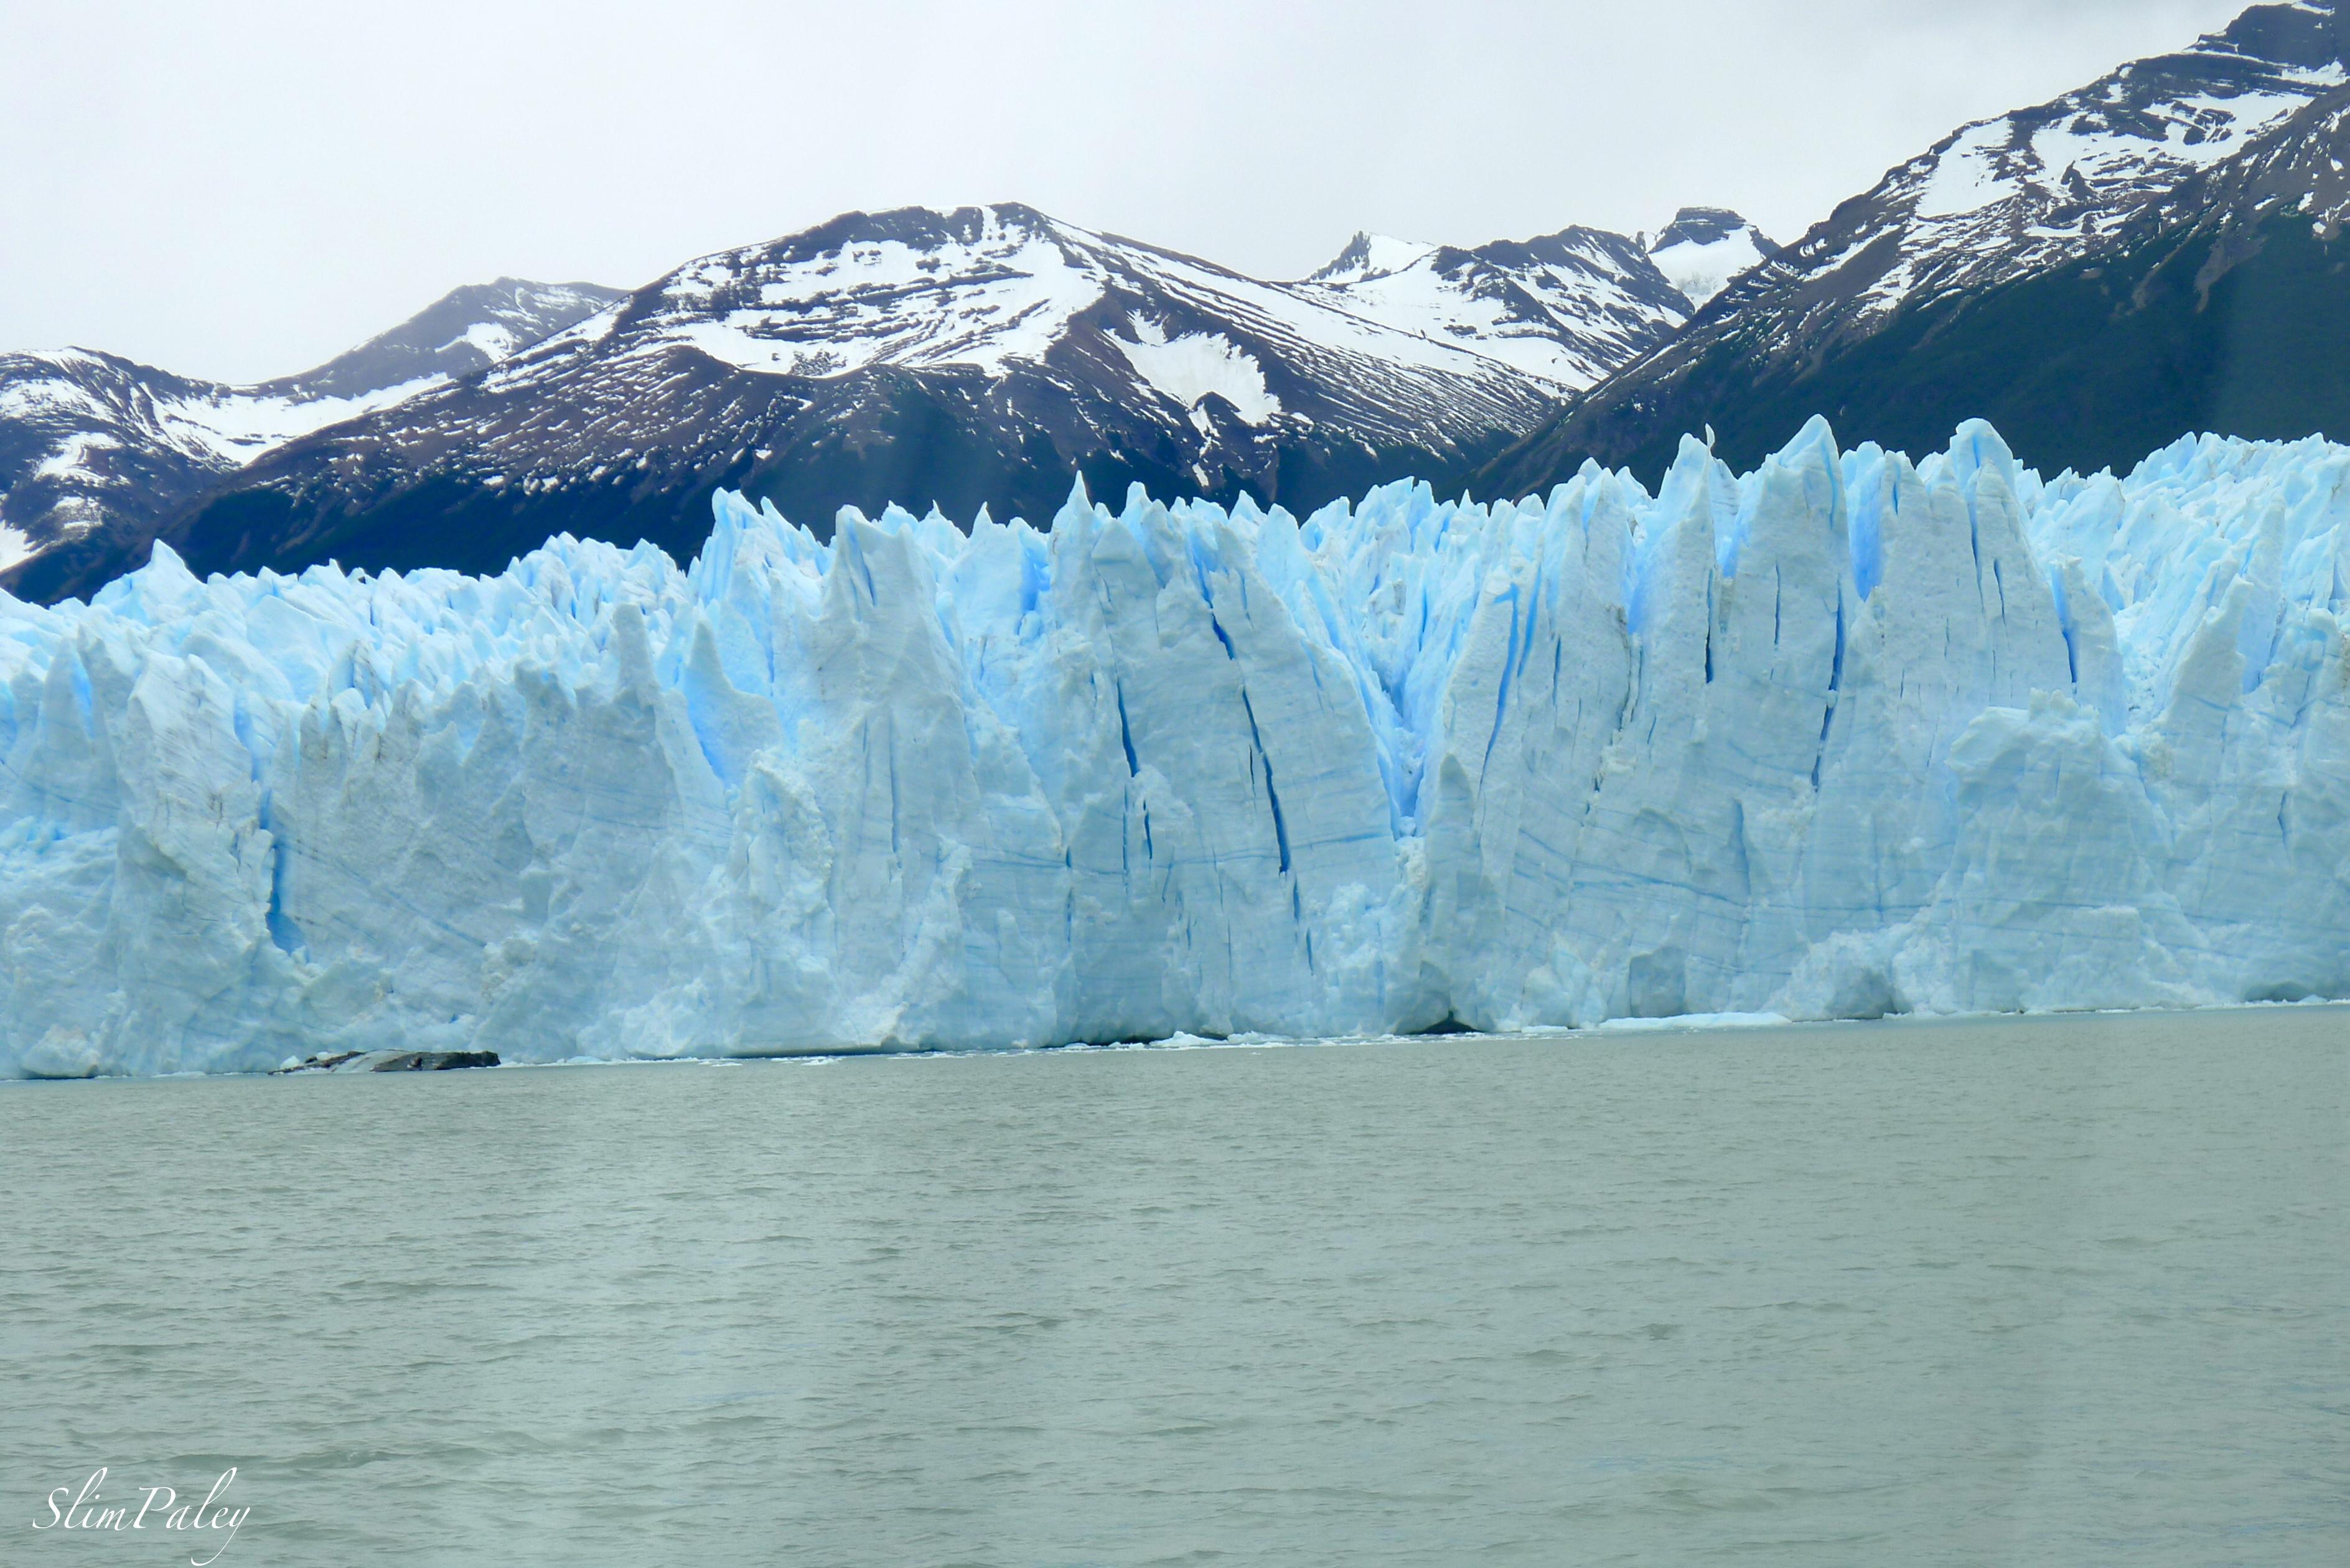 Perito Moreno glacier, Patagonia slimpaley.com